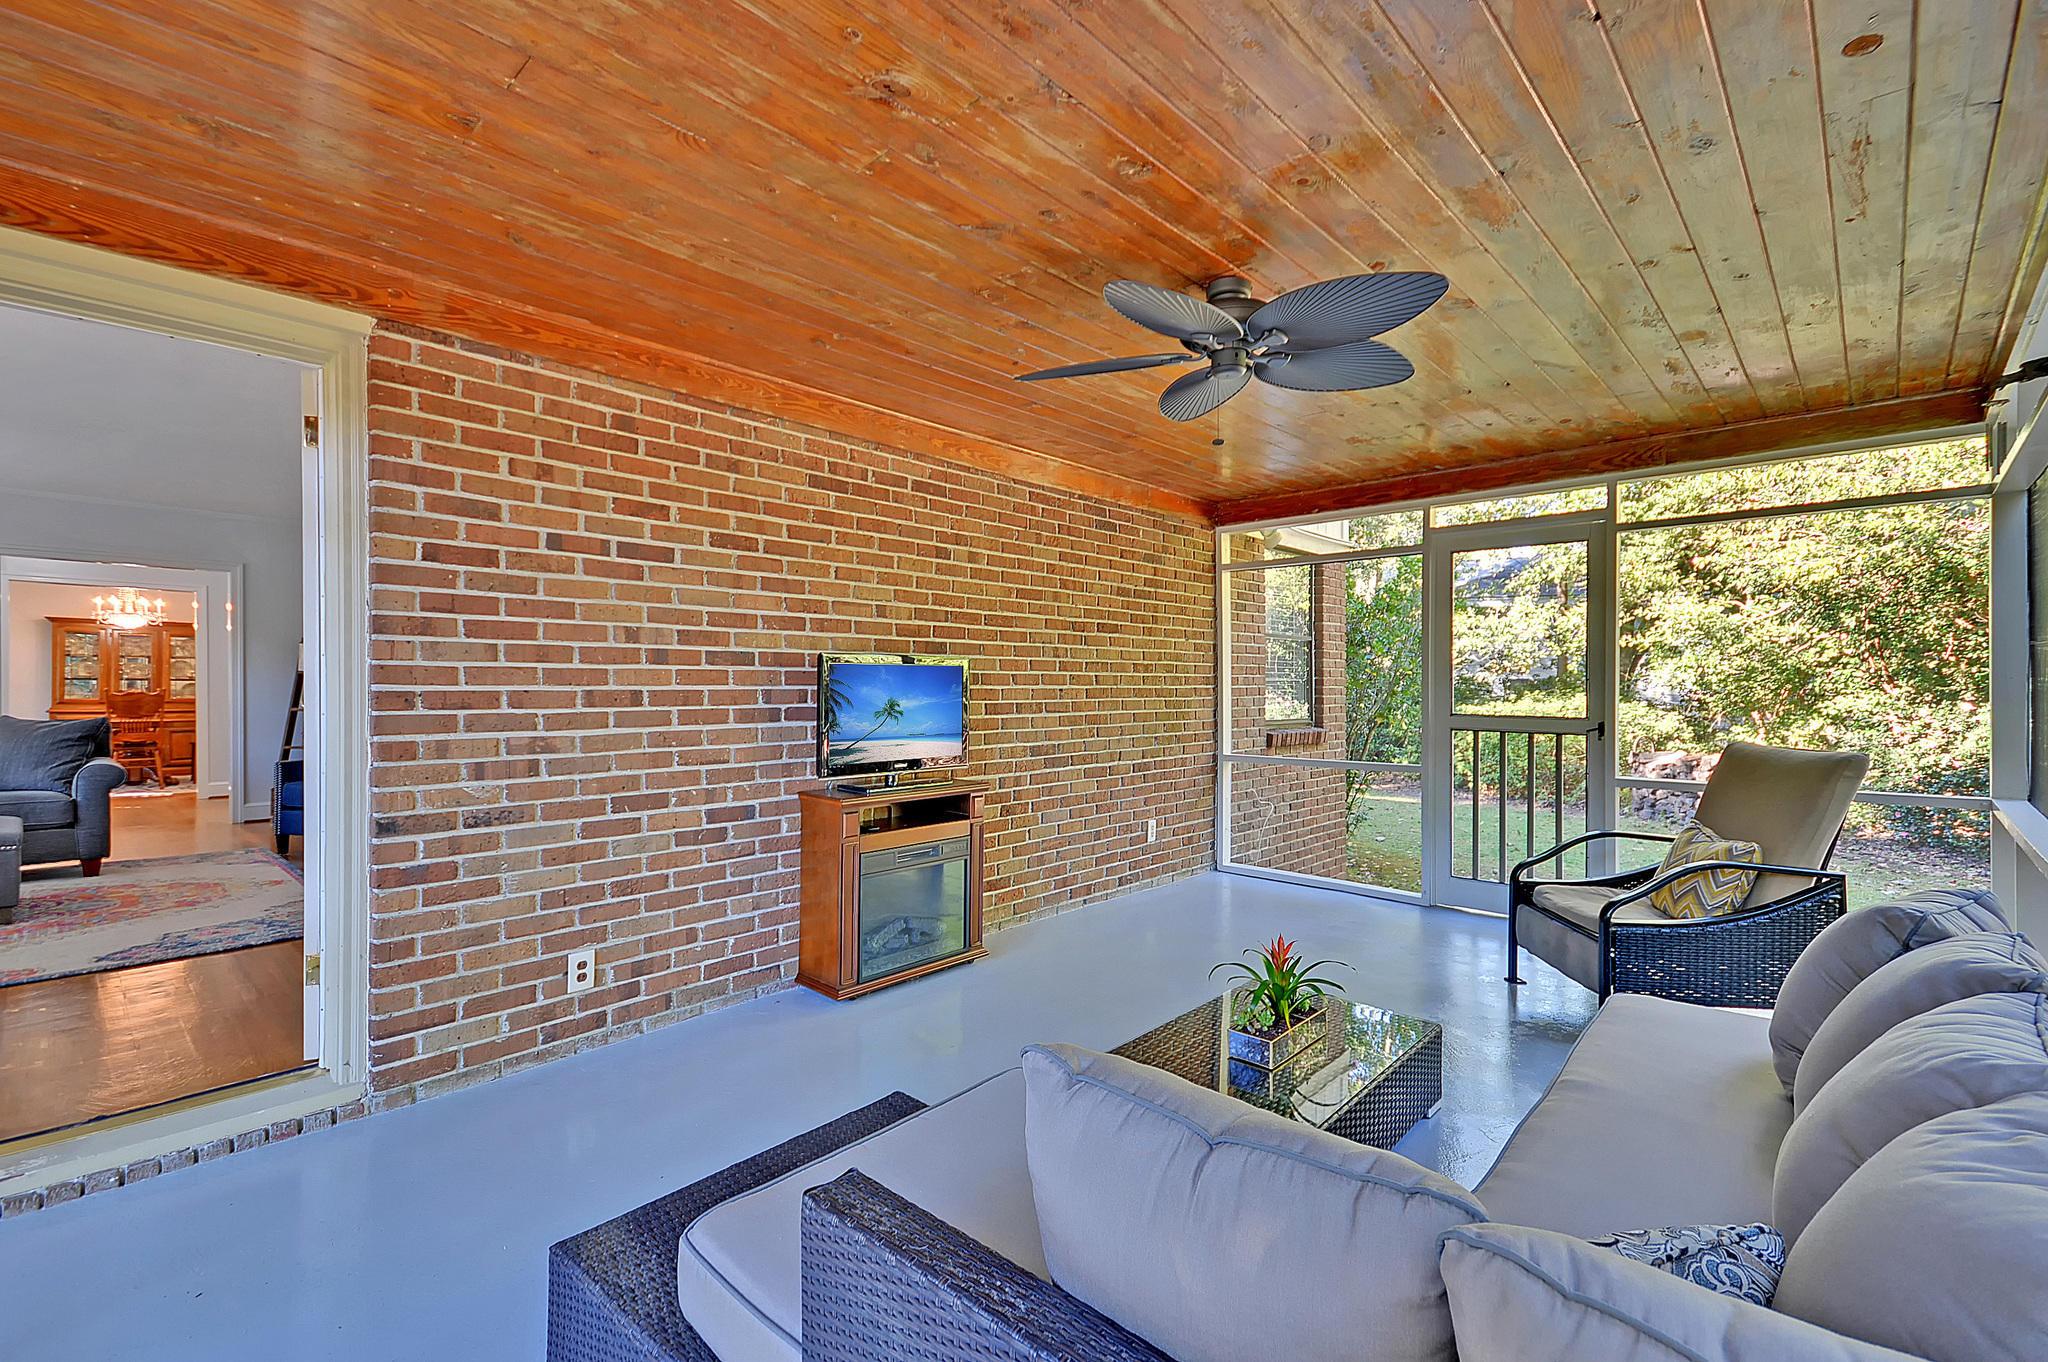 Edgewater Park Homes For Sale - 1356 Emory, Charleston, SC - 46